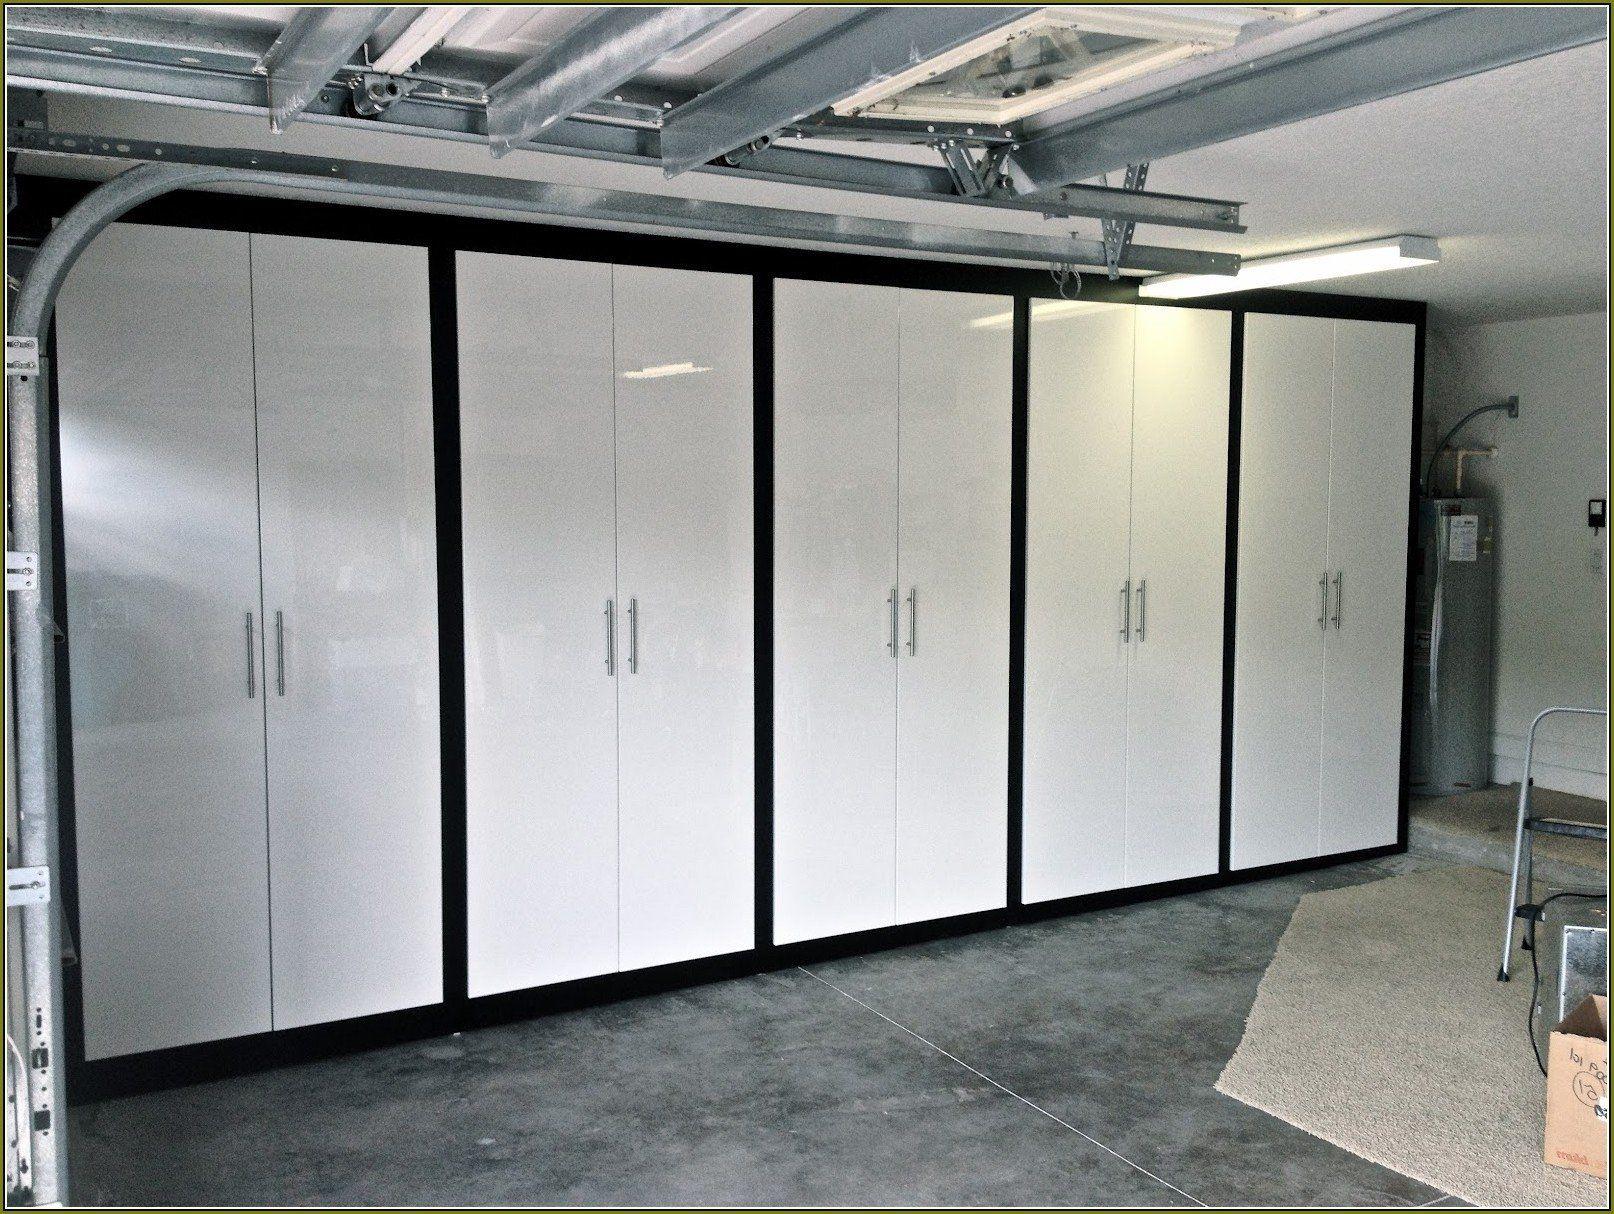 30+ Top Collection Ikea Garage Shelving   Garage cabinets ikea, Garage storage cabinets, Garage ...